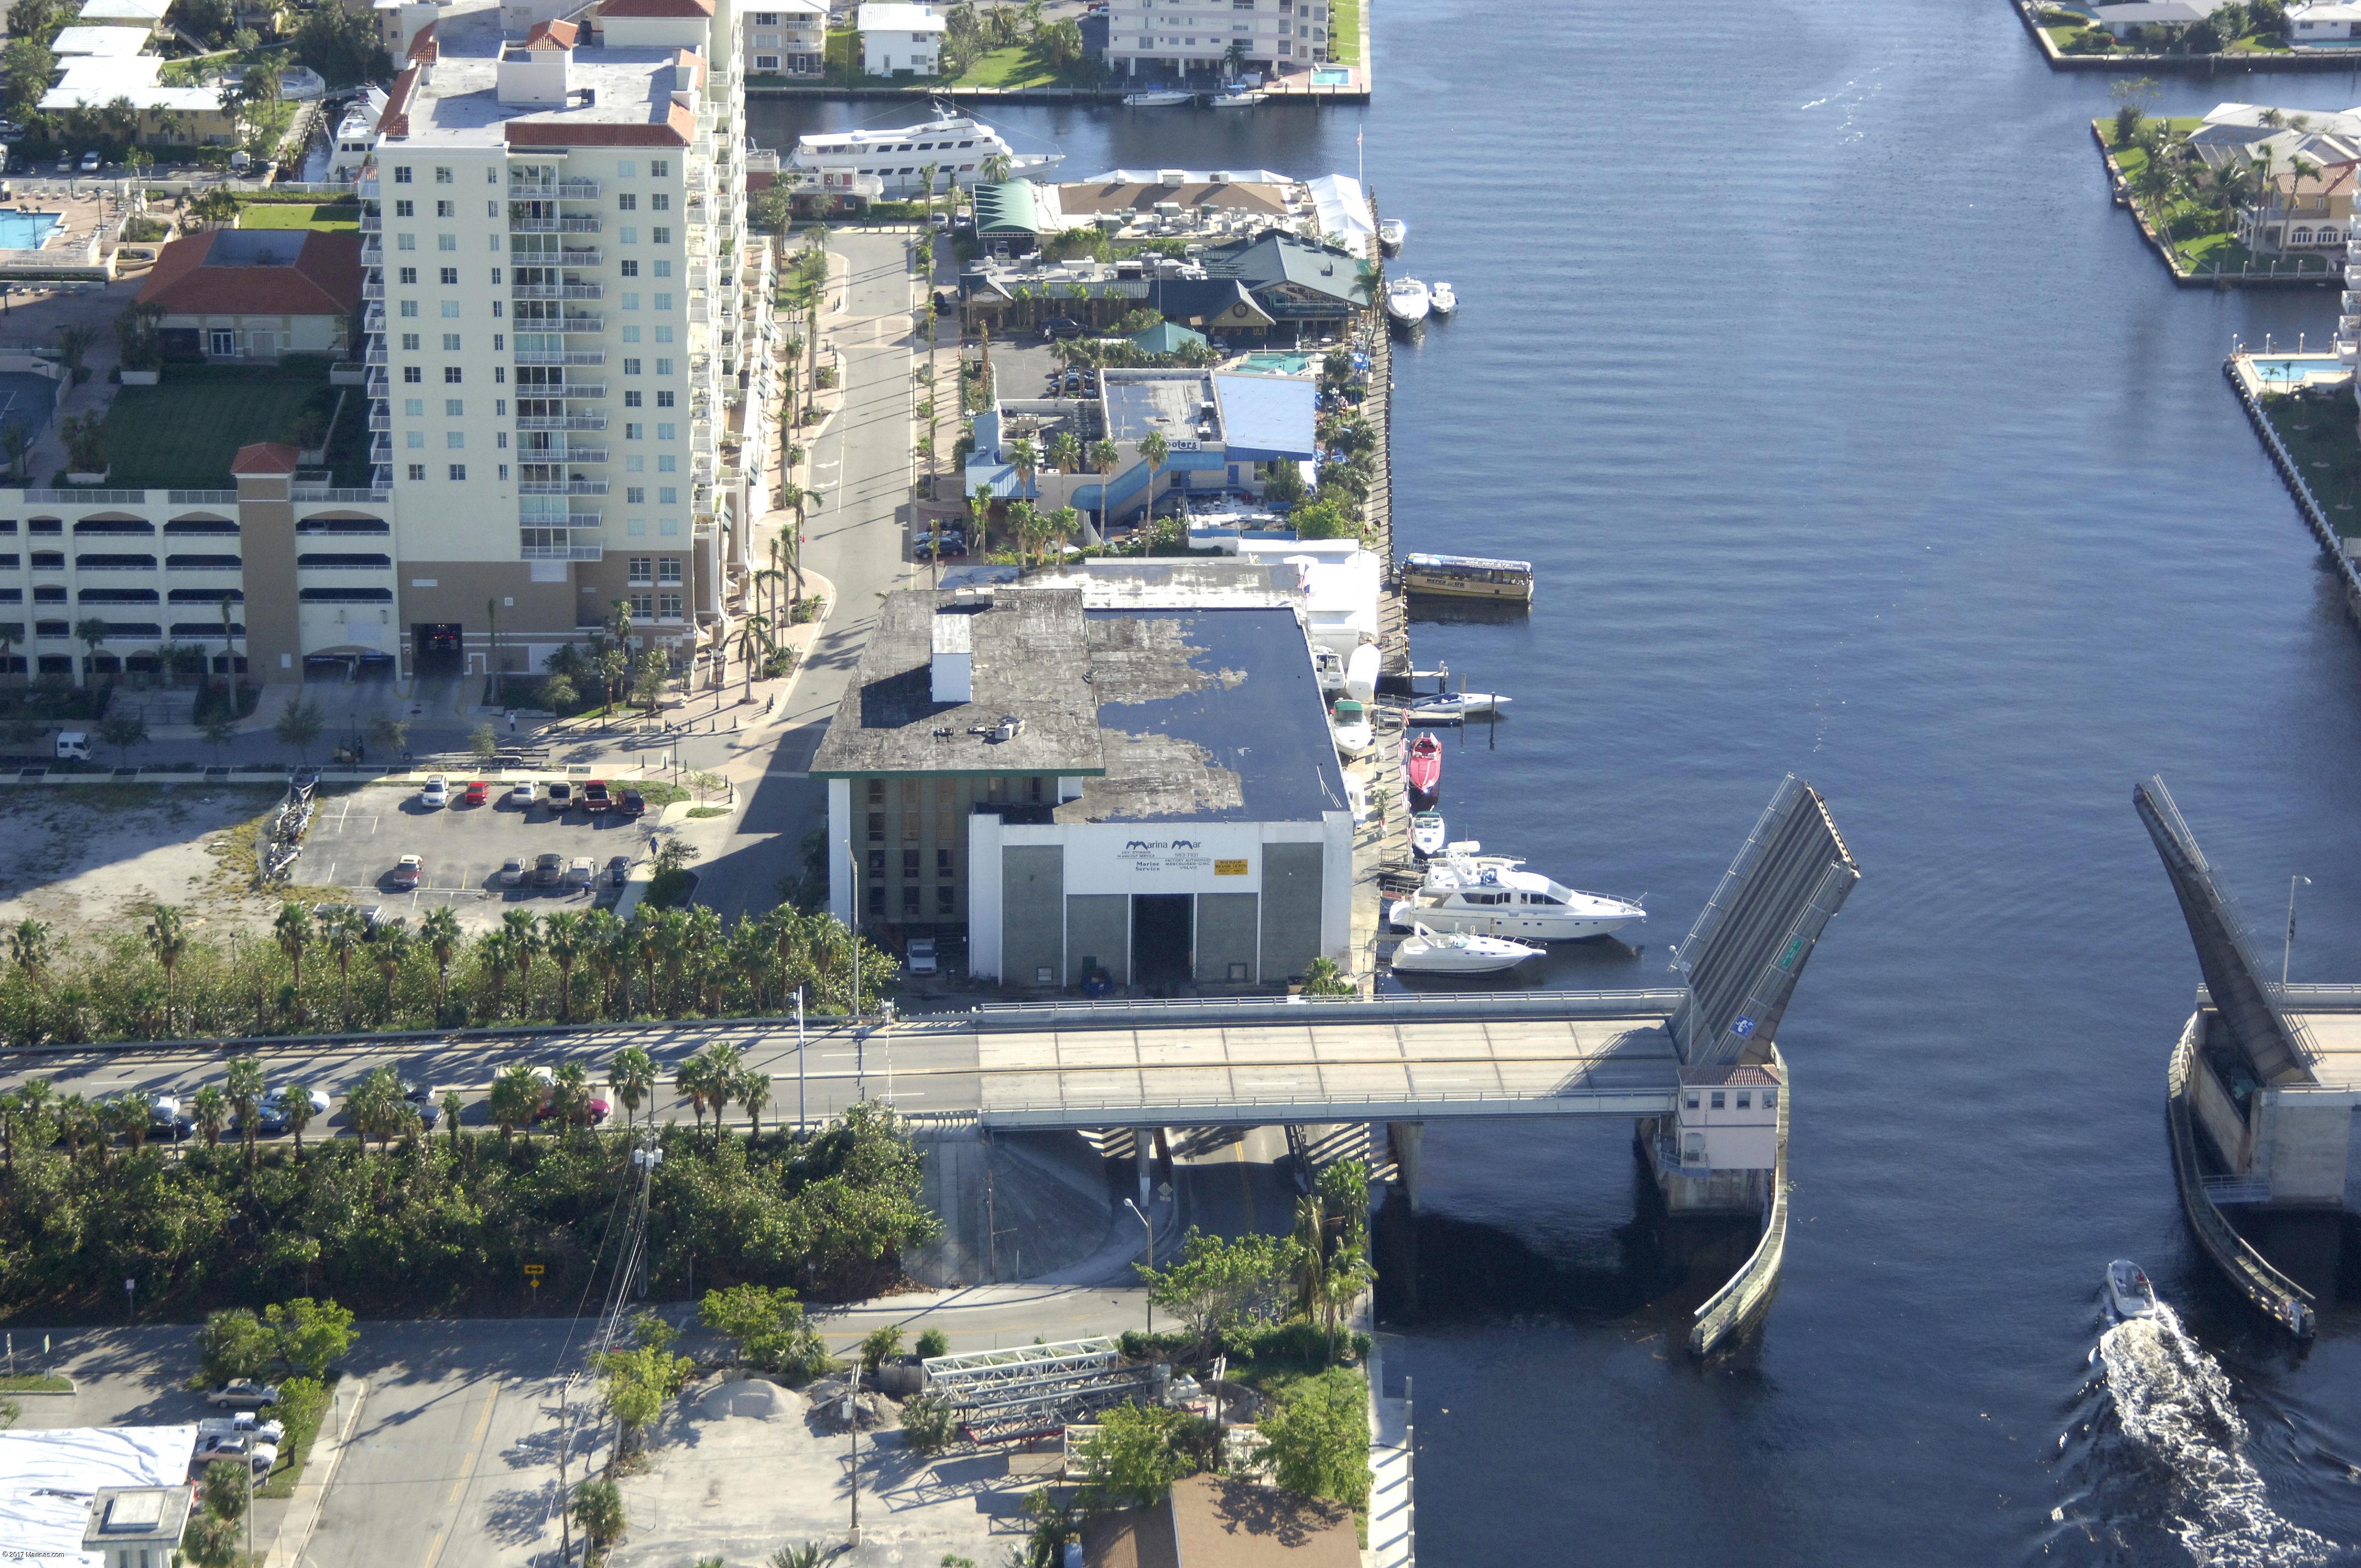 Marina Mar In Fort Lauderdale Fl United States Marina